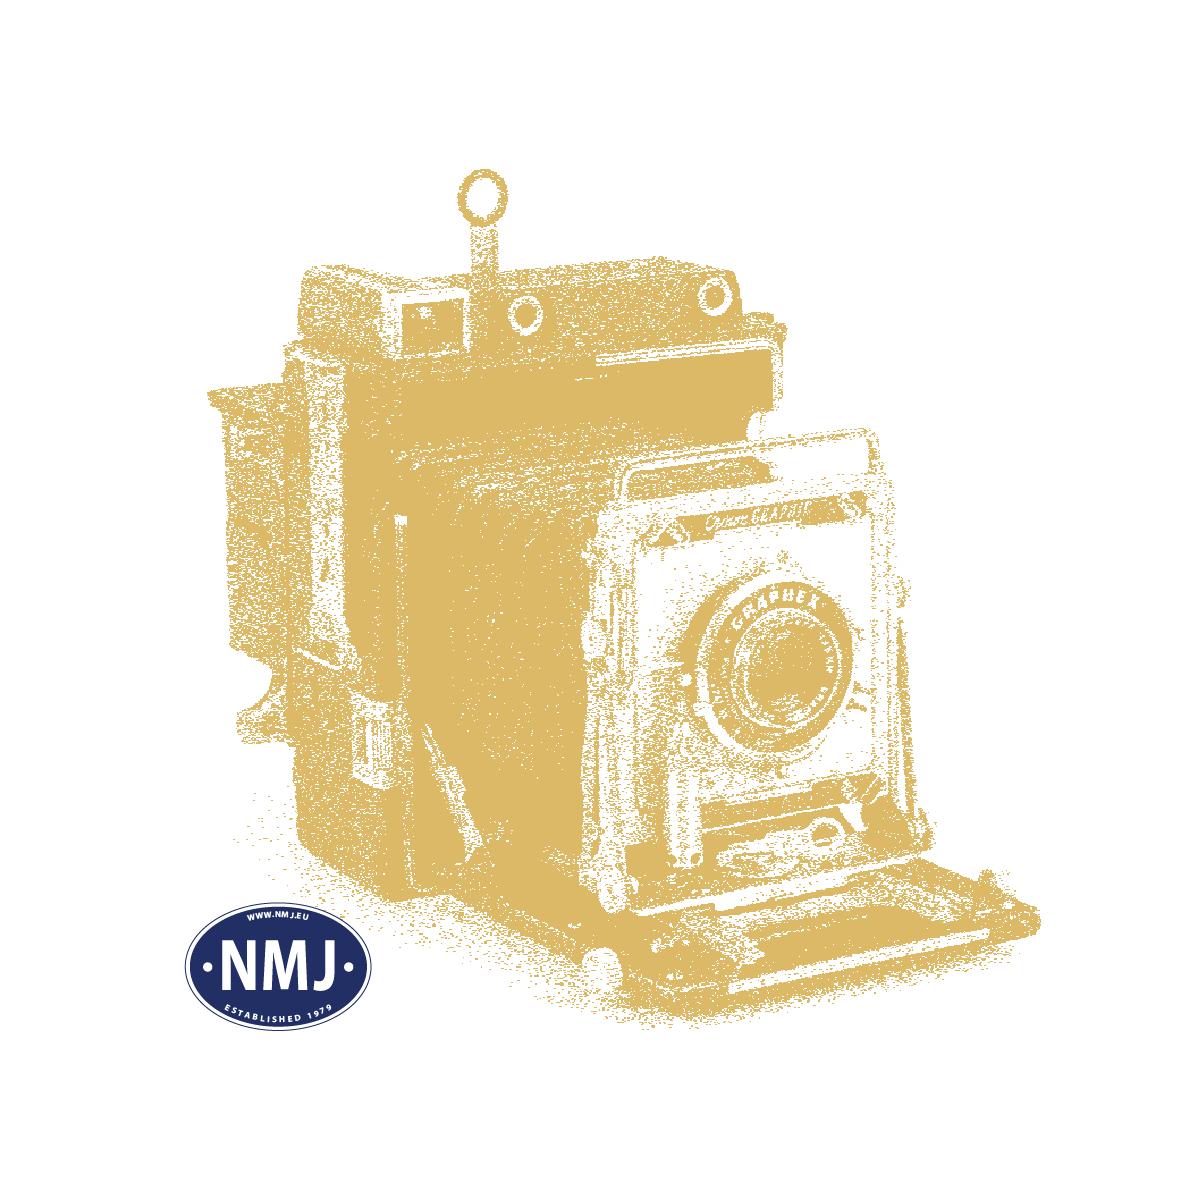 NMJT90604 - NMJ Topline CLR MY.1151, DC